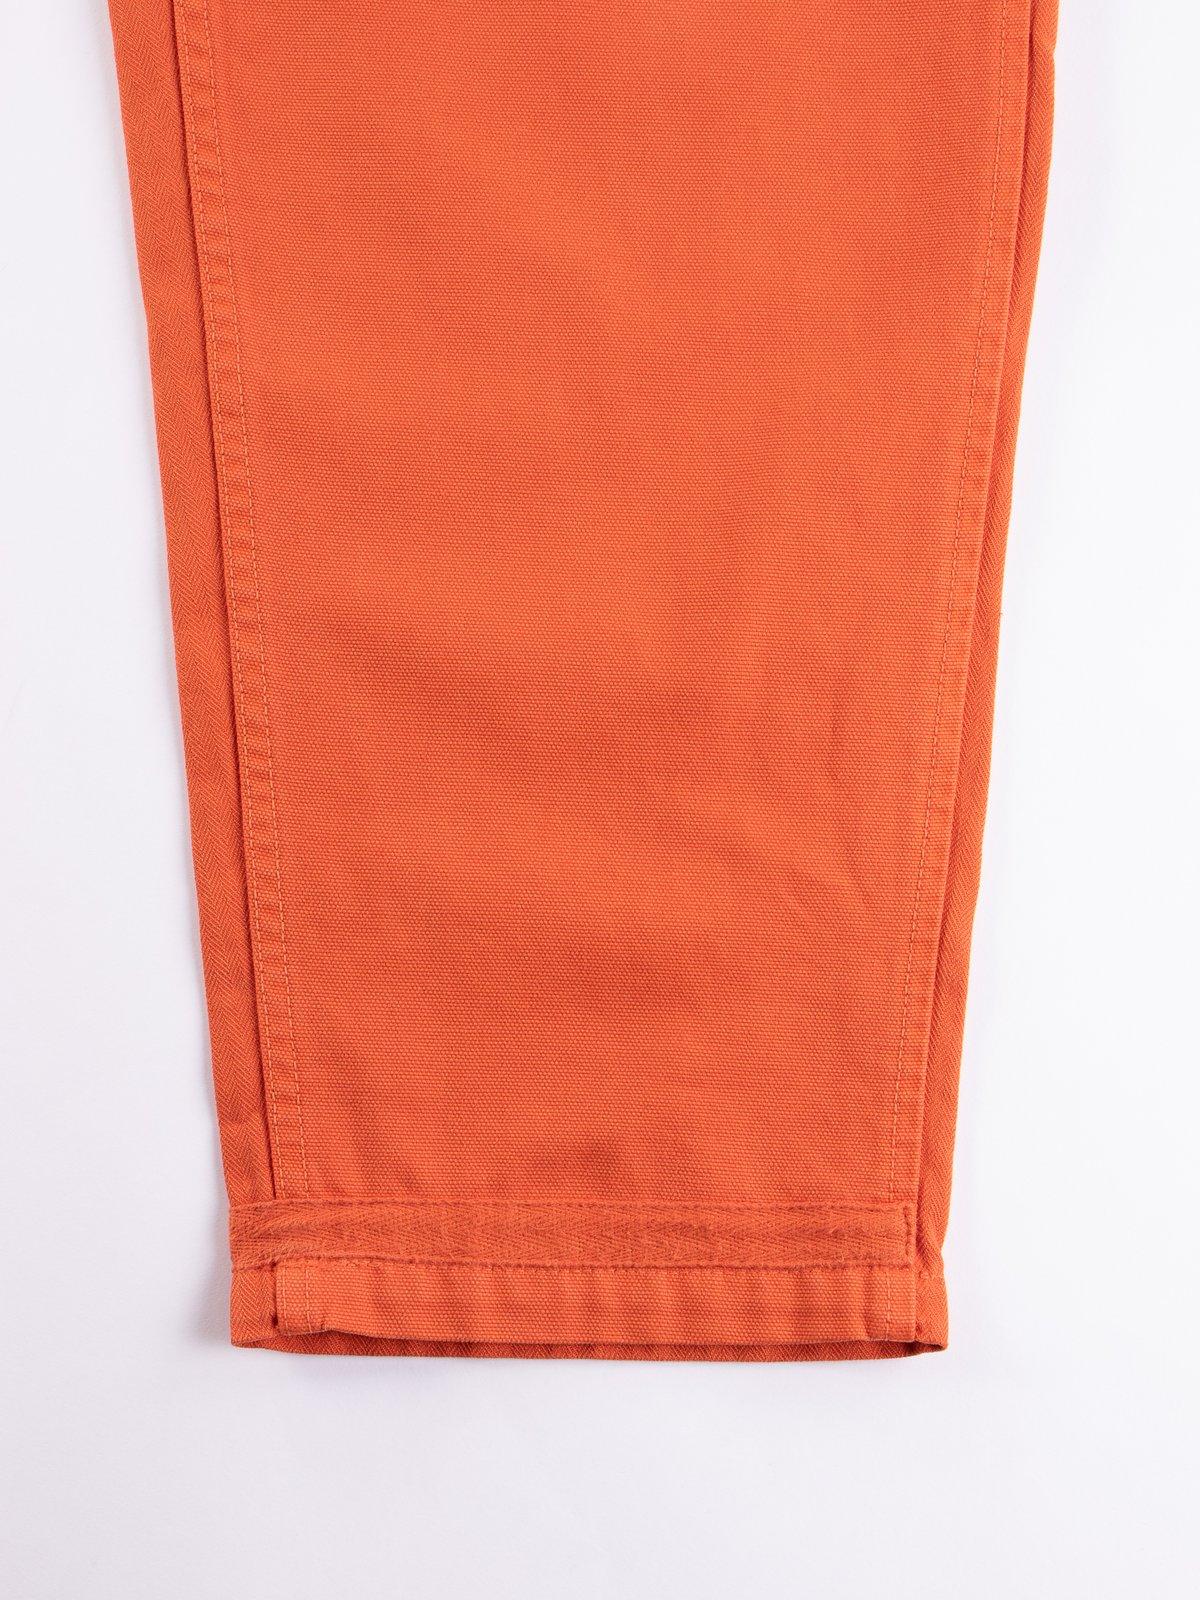 Lybro Vintage Orange Naval Dungaree - Image 4